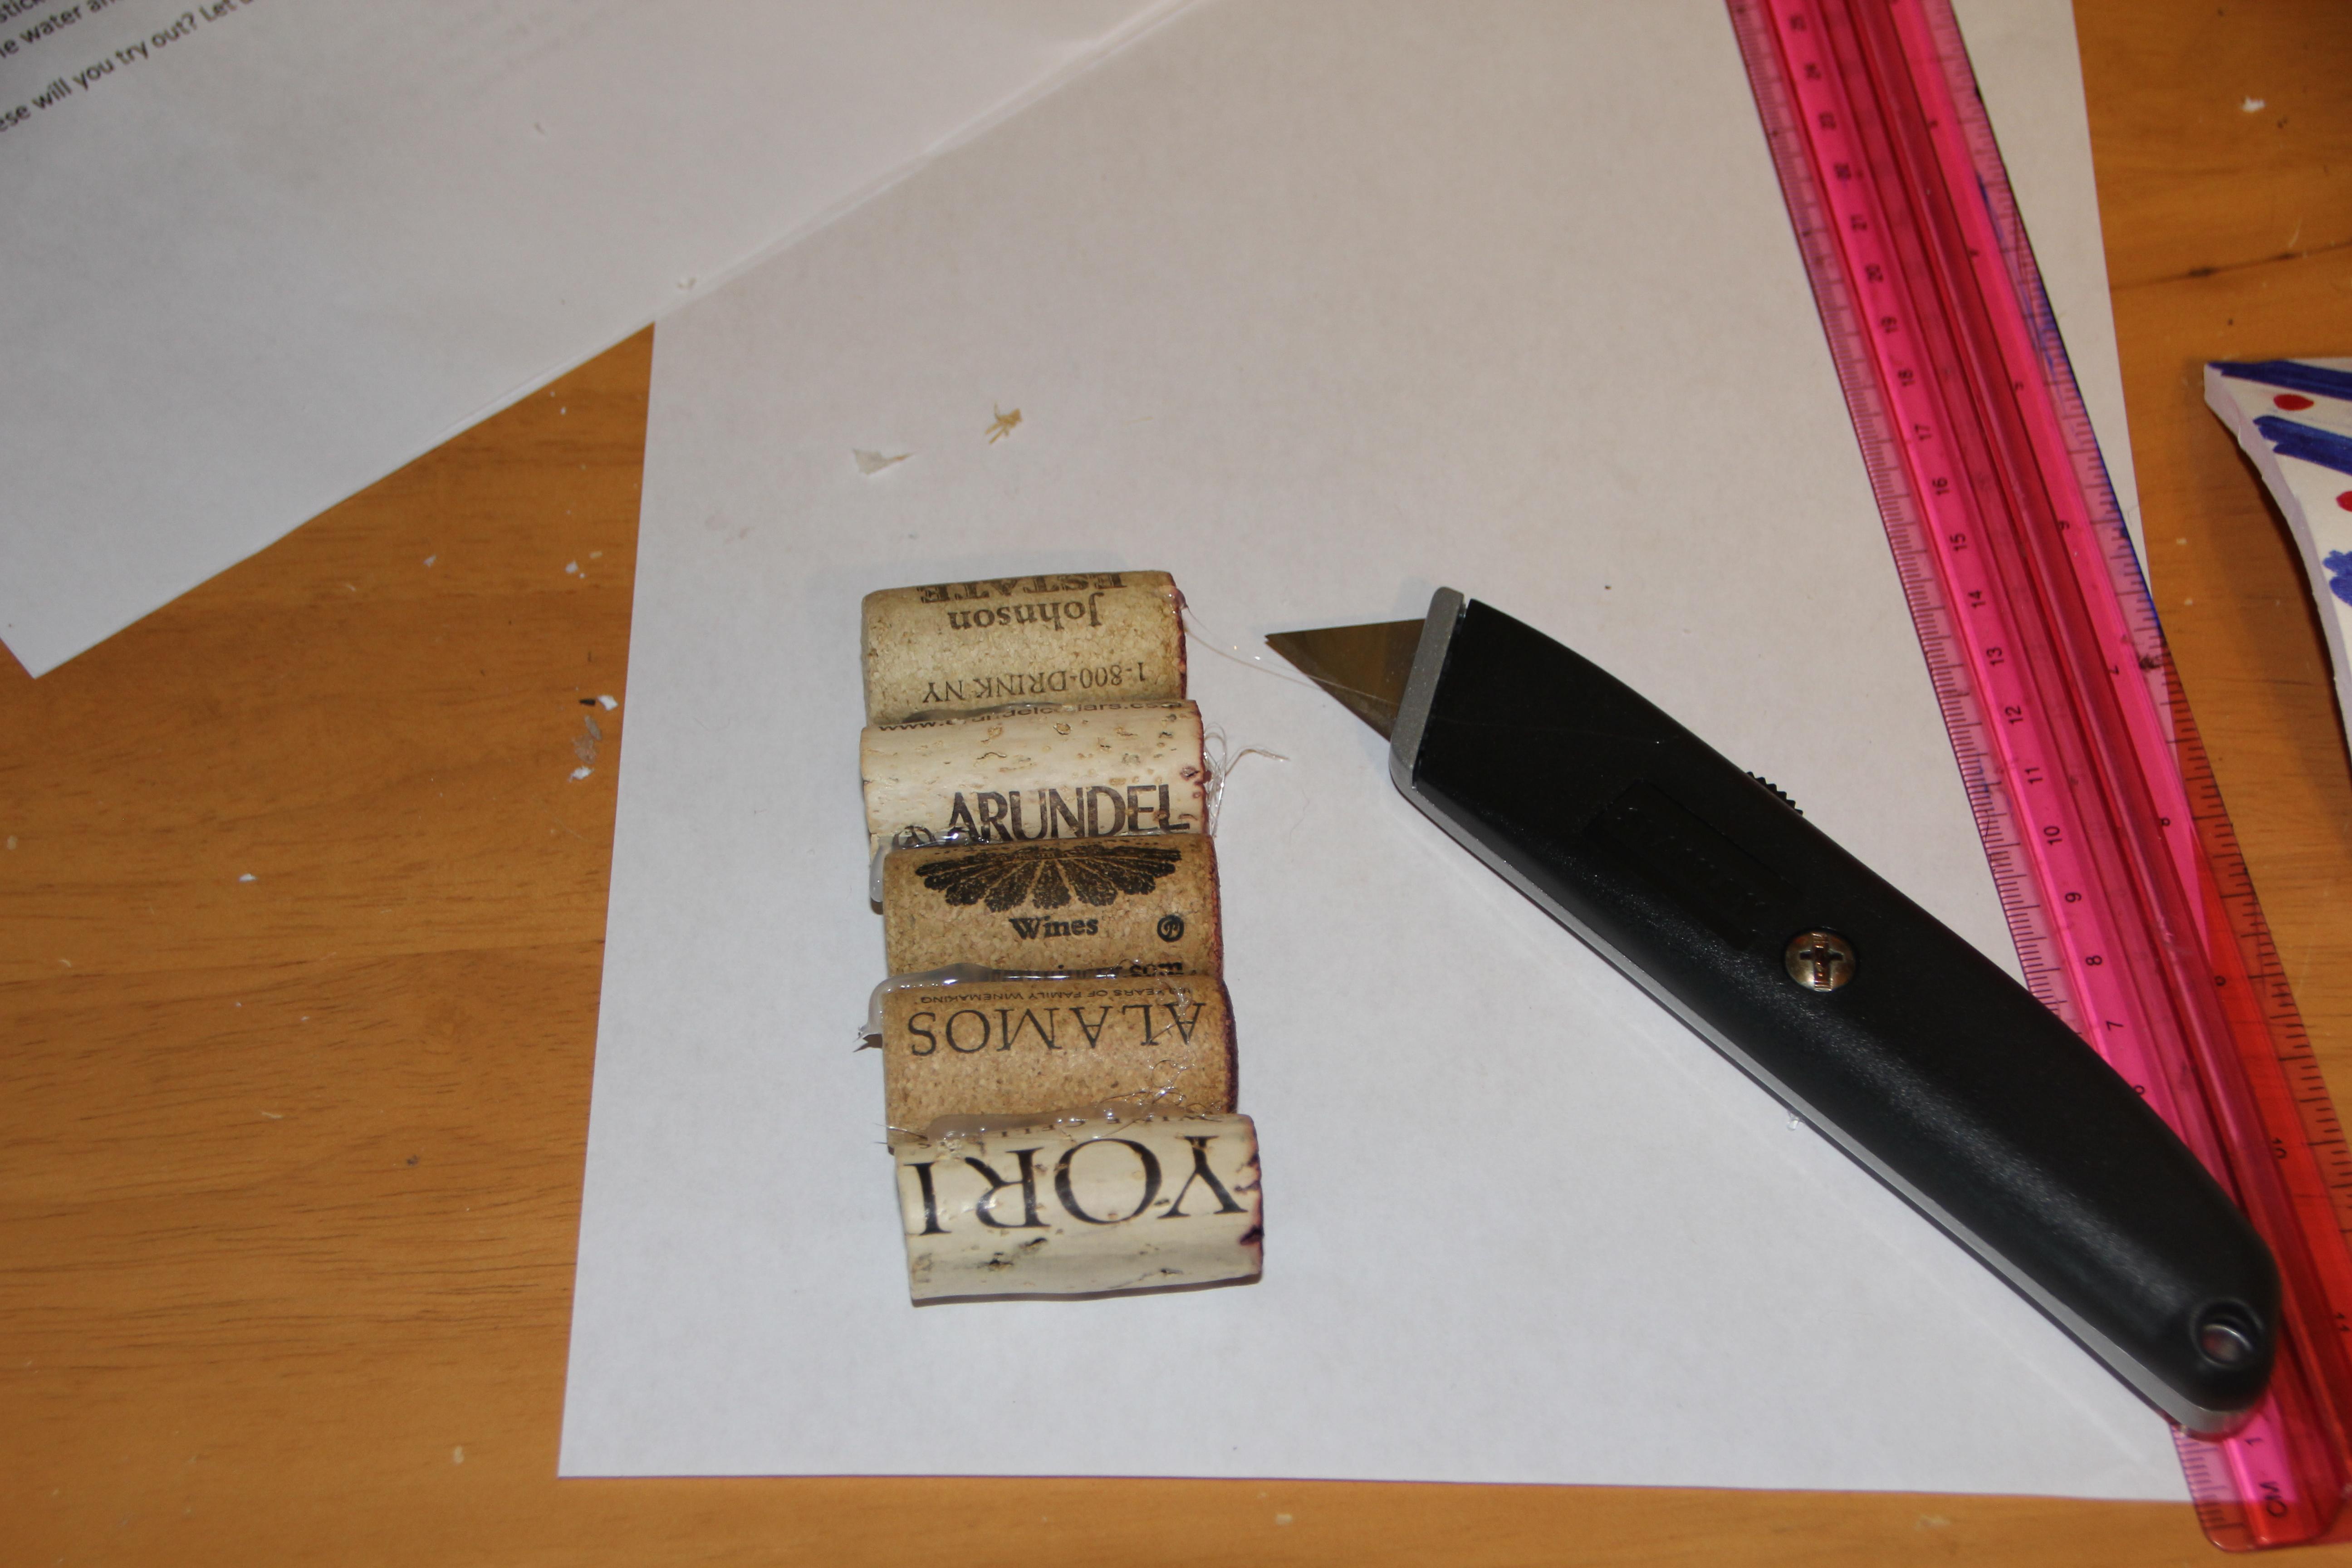 Put slice into center cork